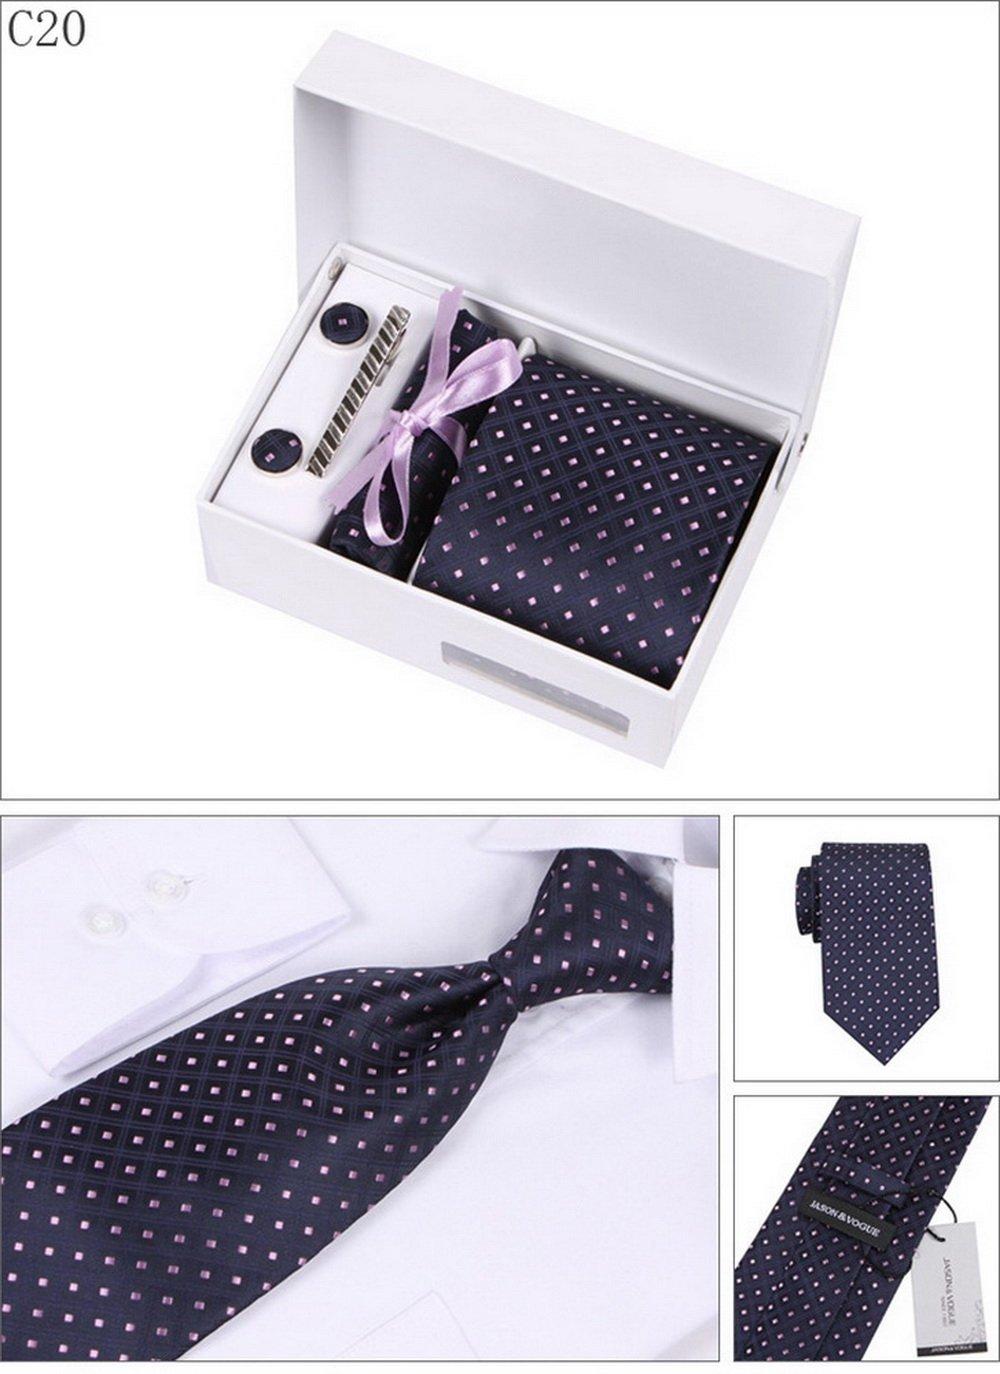 PAHALA Mens Fashion Necktie Cufflinks Tie Bar Pocket Square Set Box (C6) PAHALAC6